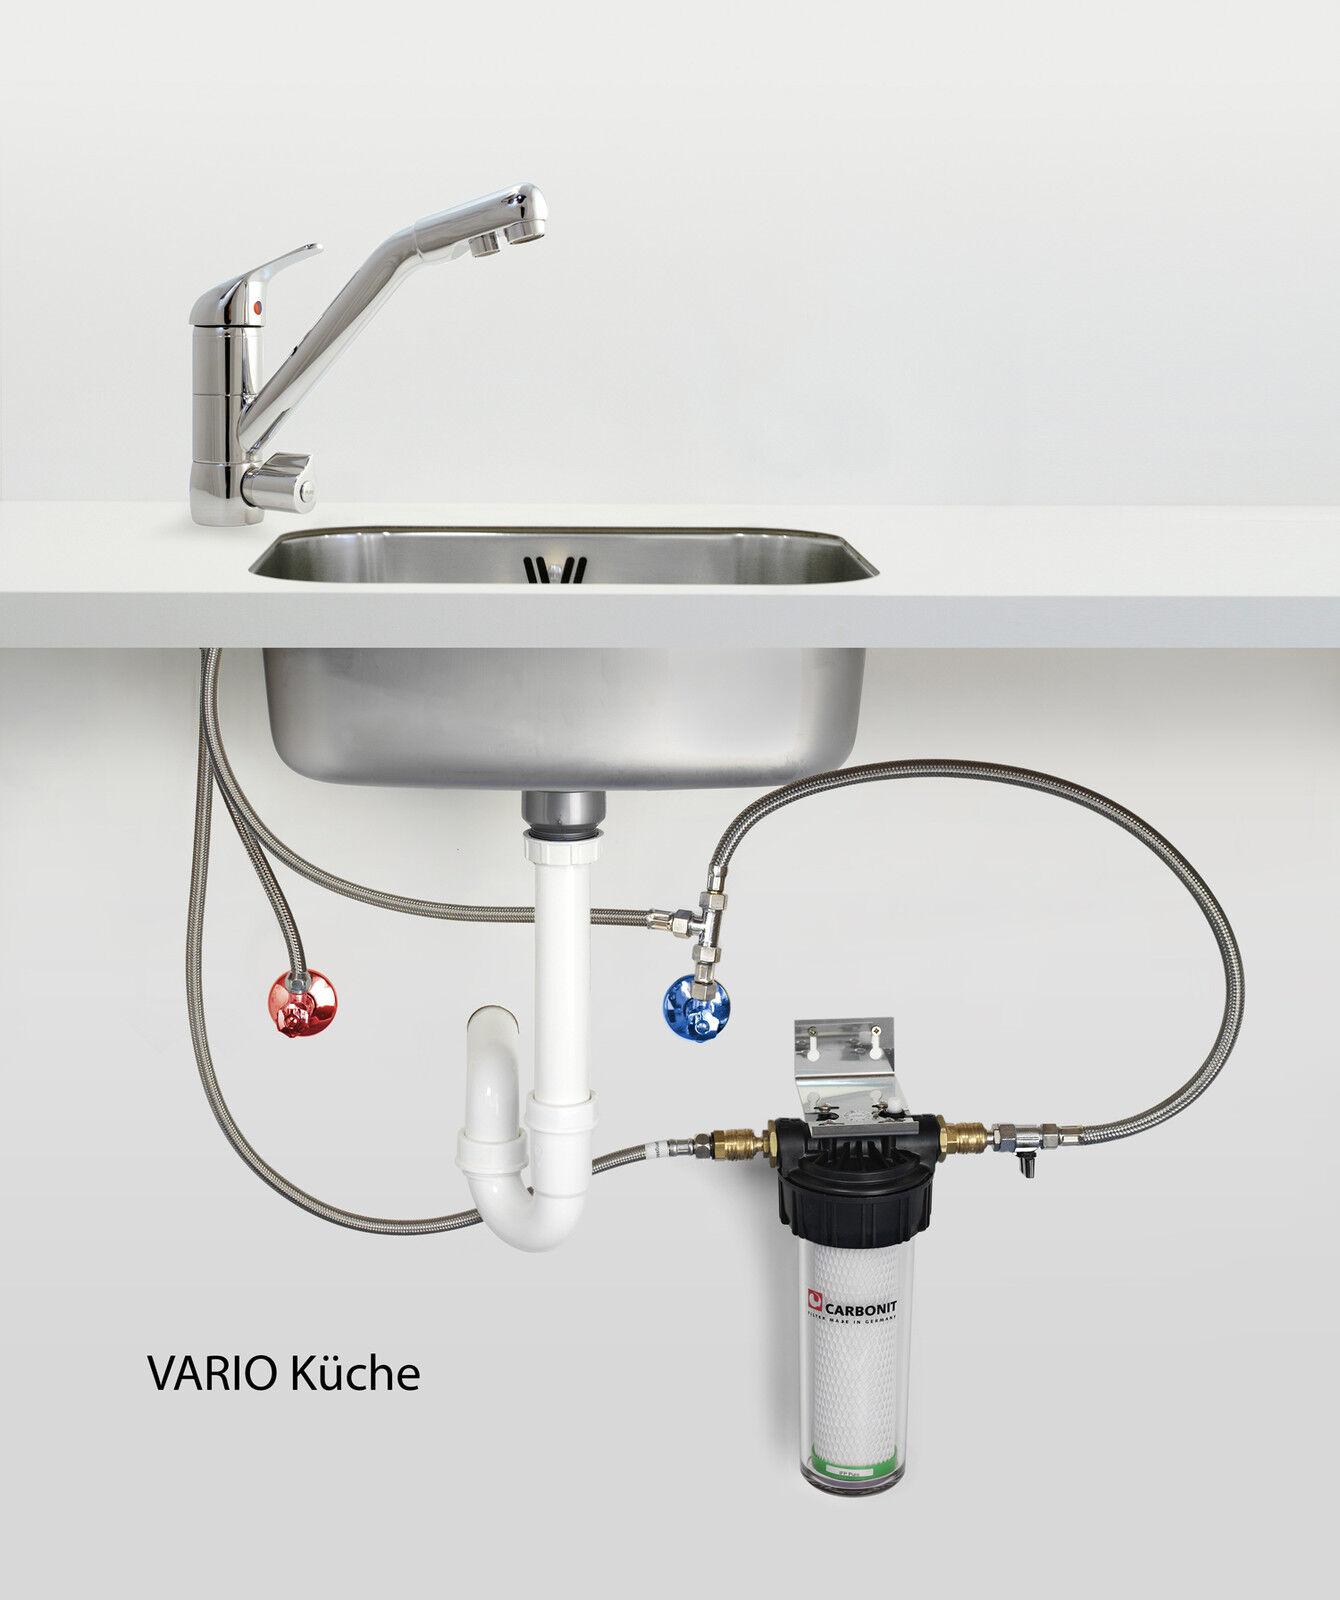 CARBONIT vario Cuisine Filtre Avec ws 6 Combi robinet